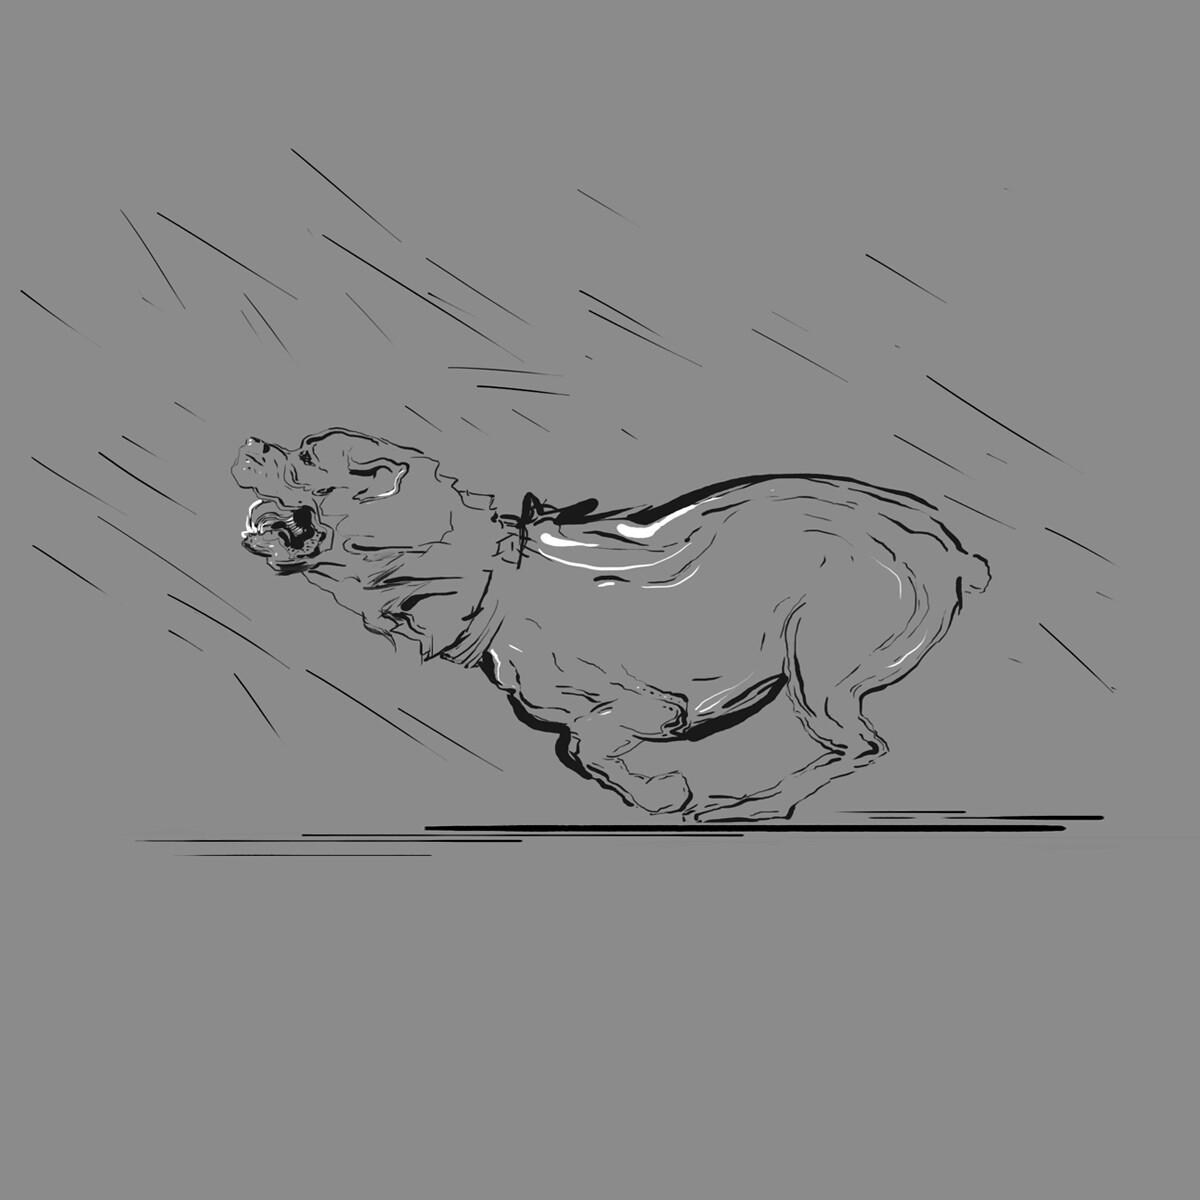 Rottweiler concept scetch